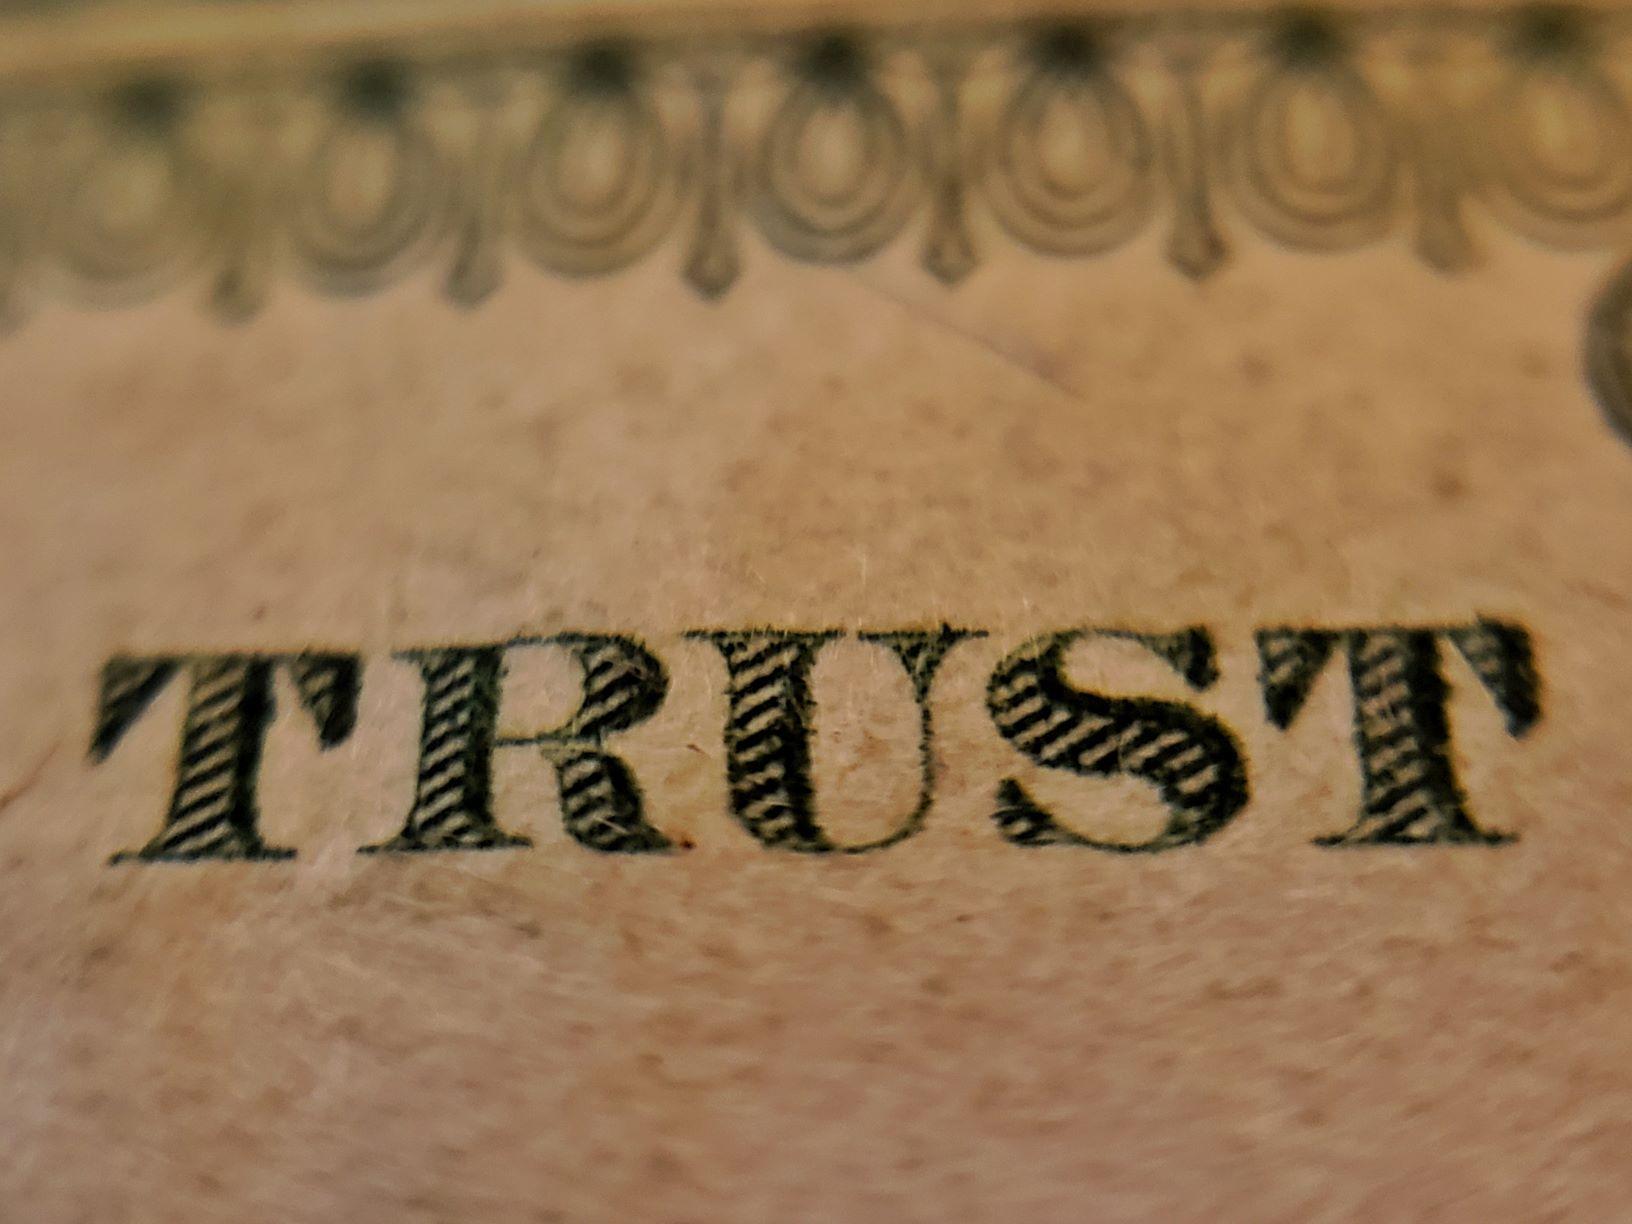 Expansion of Trust Registration Service